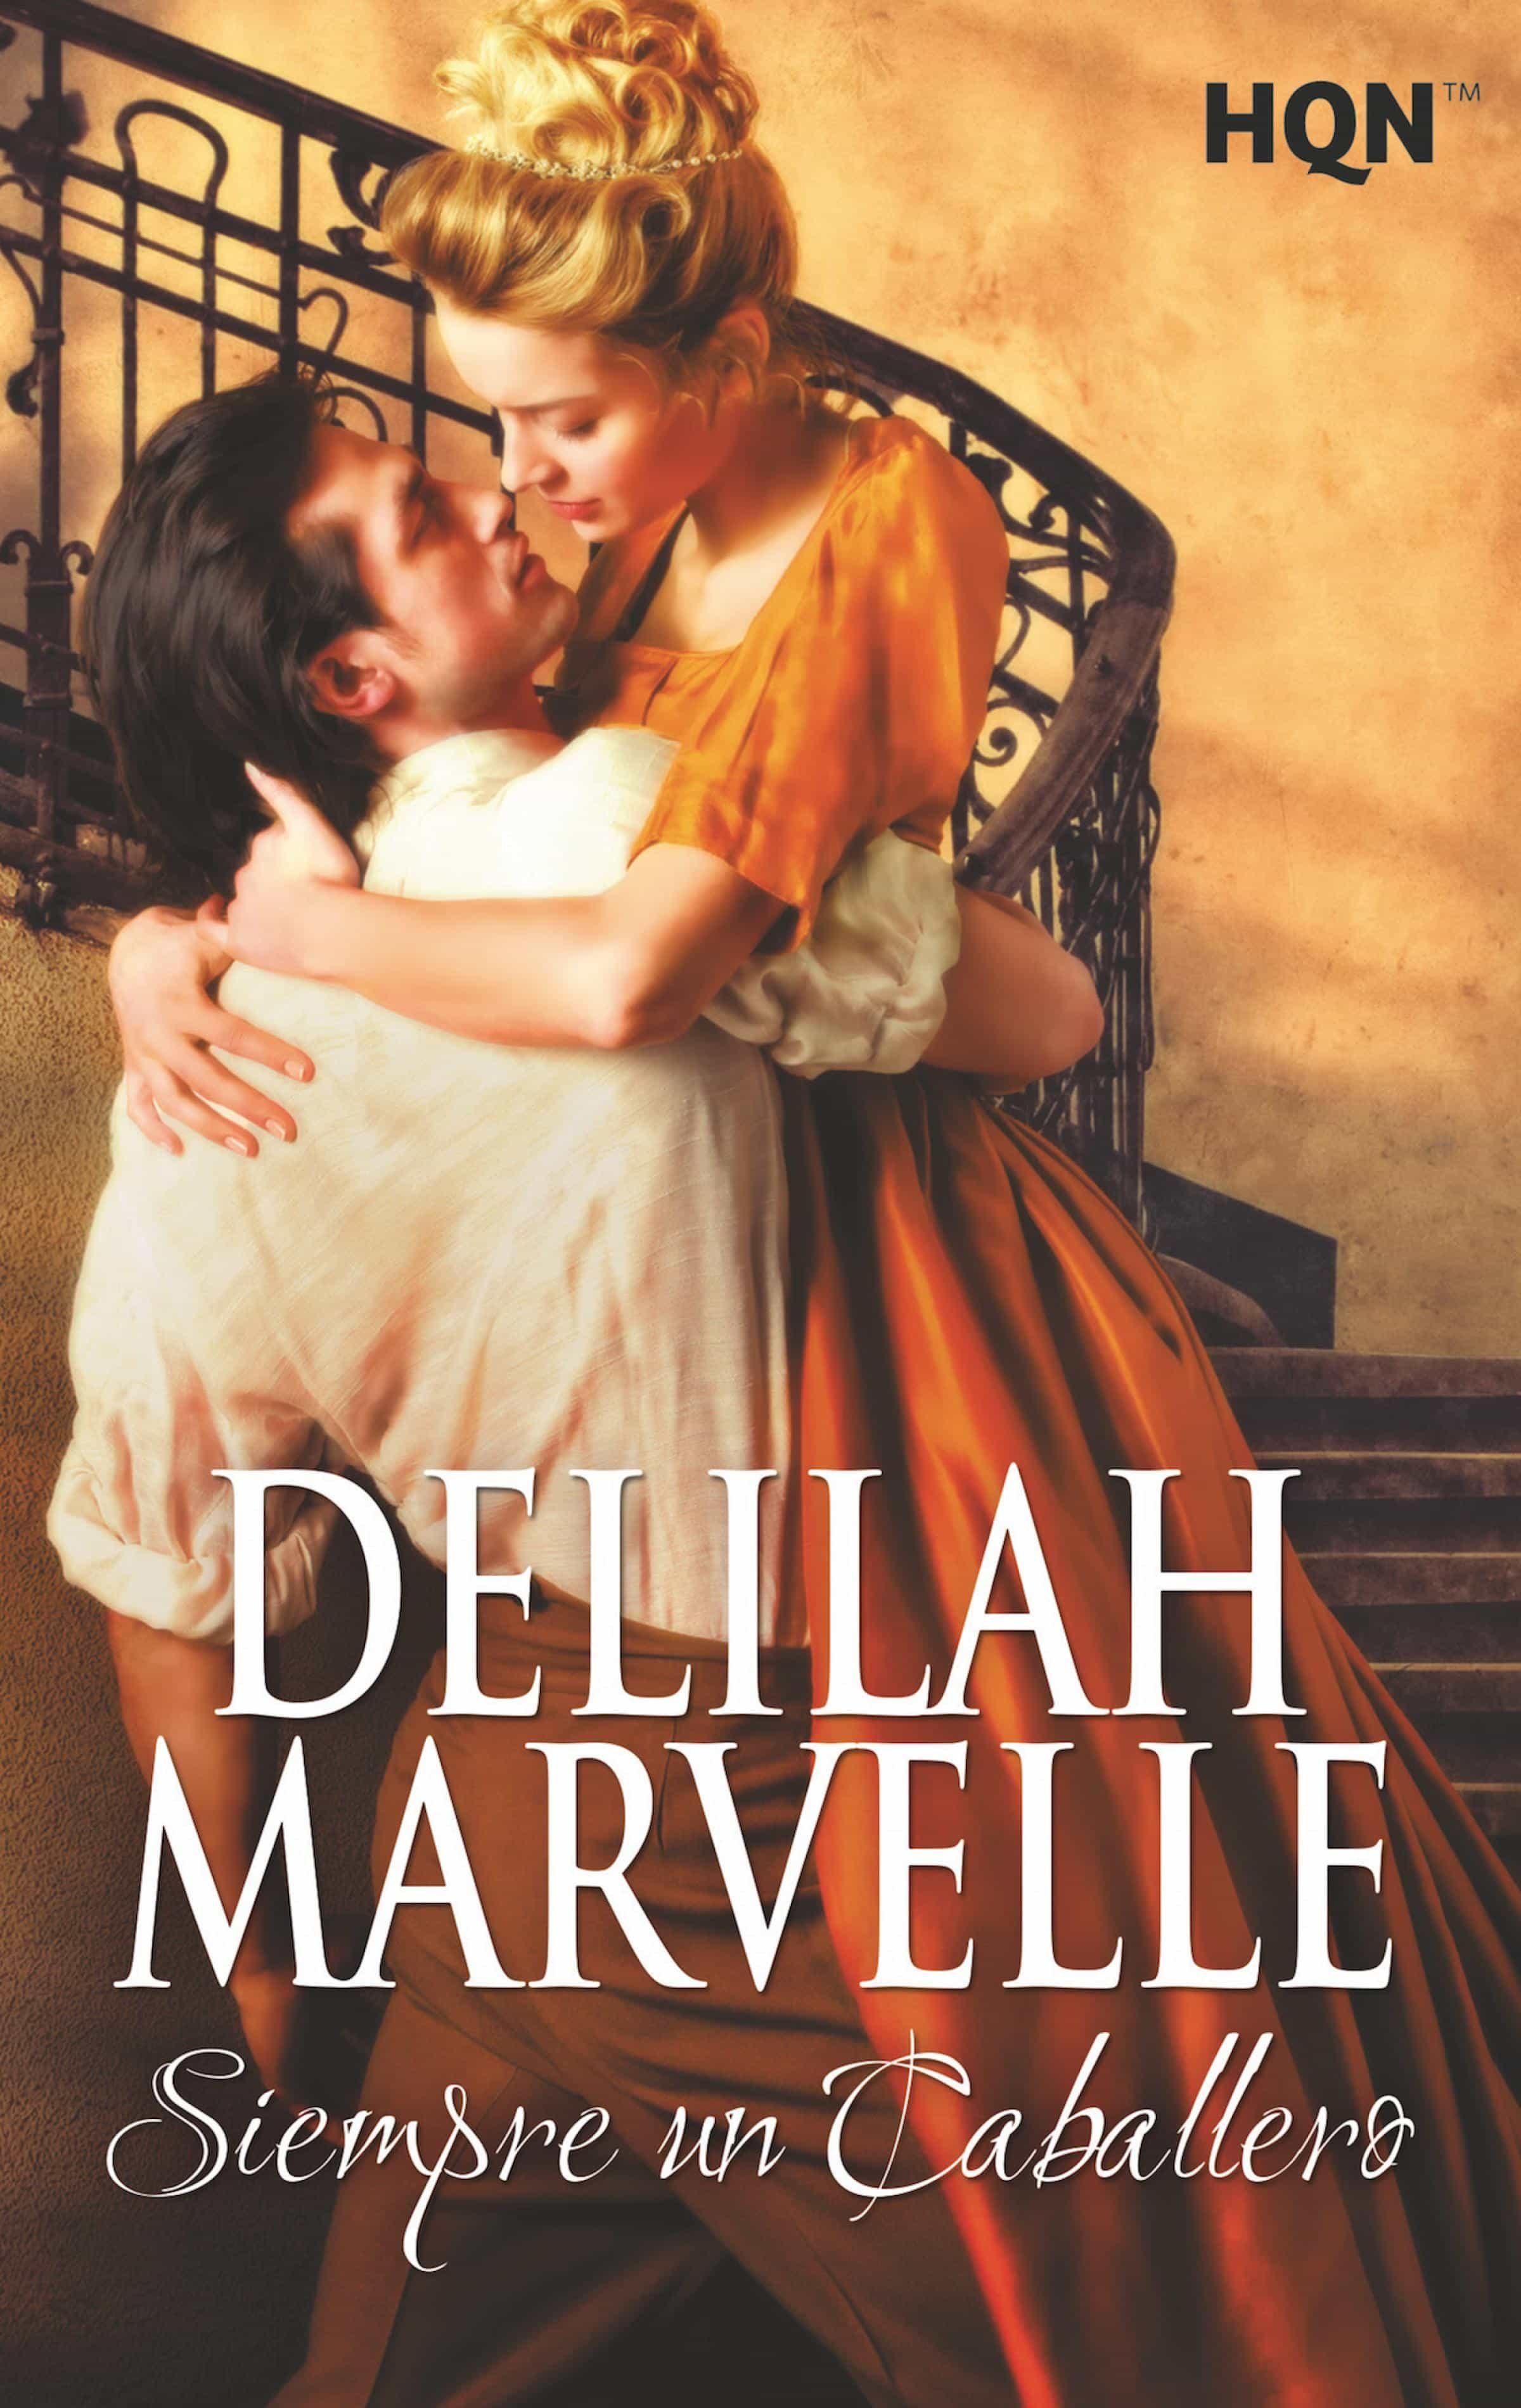 Siempre Un Caballero Ebook Delilah Marvelle Descargar Libro Pdf